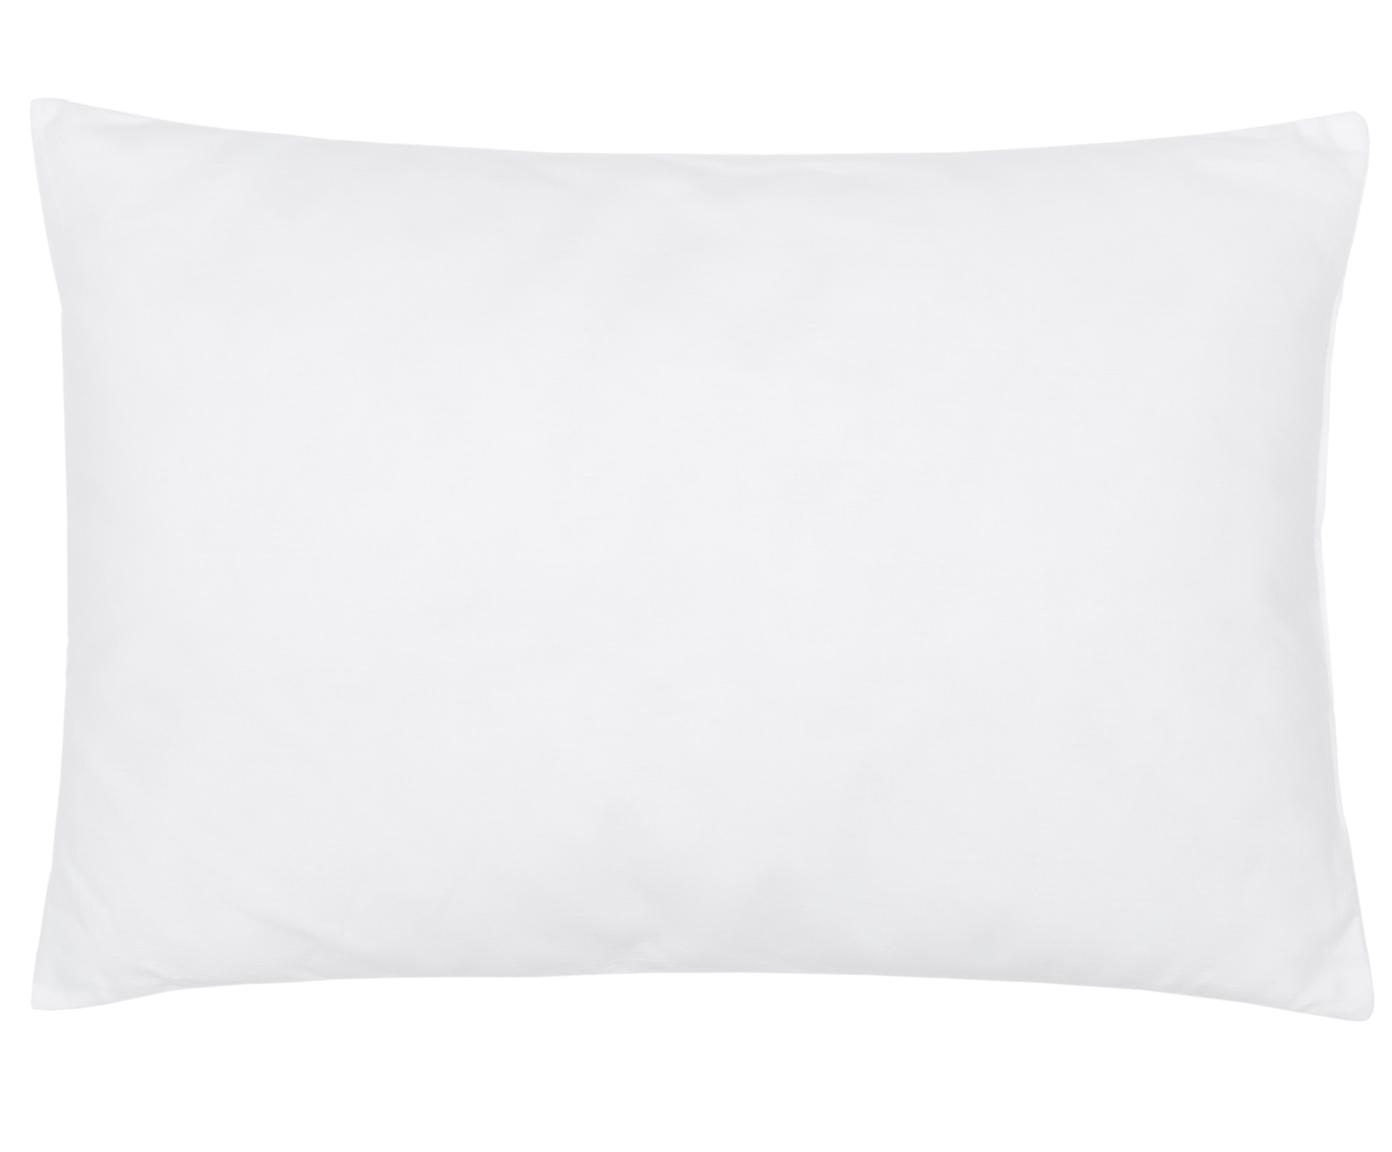 Relleno de cojín de microfibras Sia, 40x60, Funda: 100%algodón, Blanco, An 40 x L 60 cm